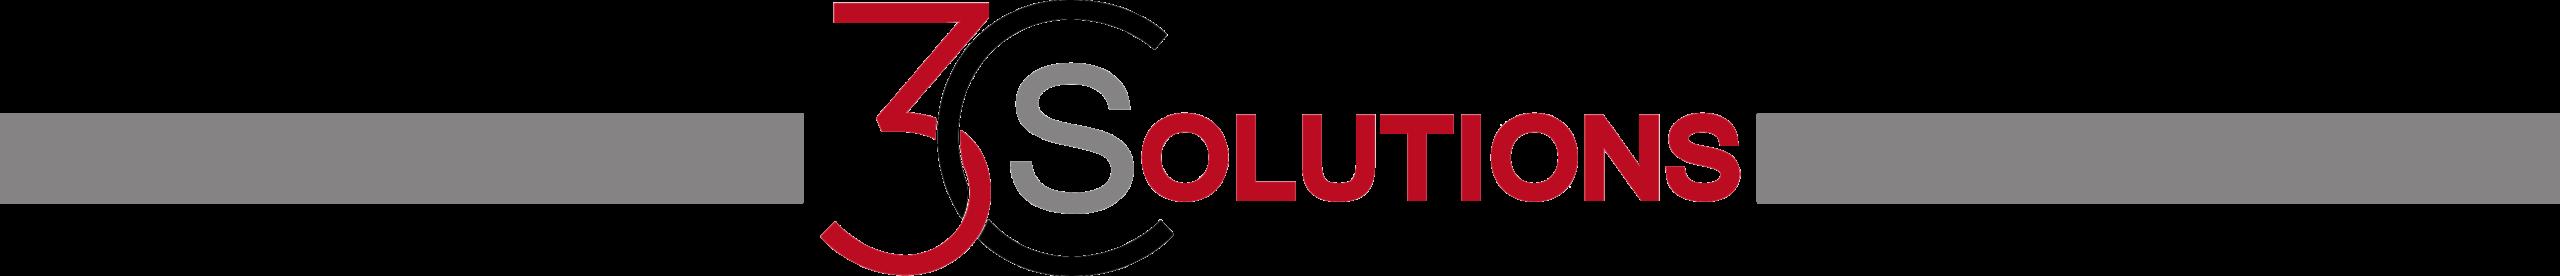 logo 3CSolutions avec bande grise